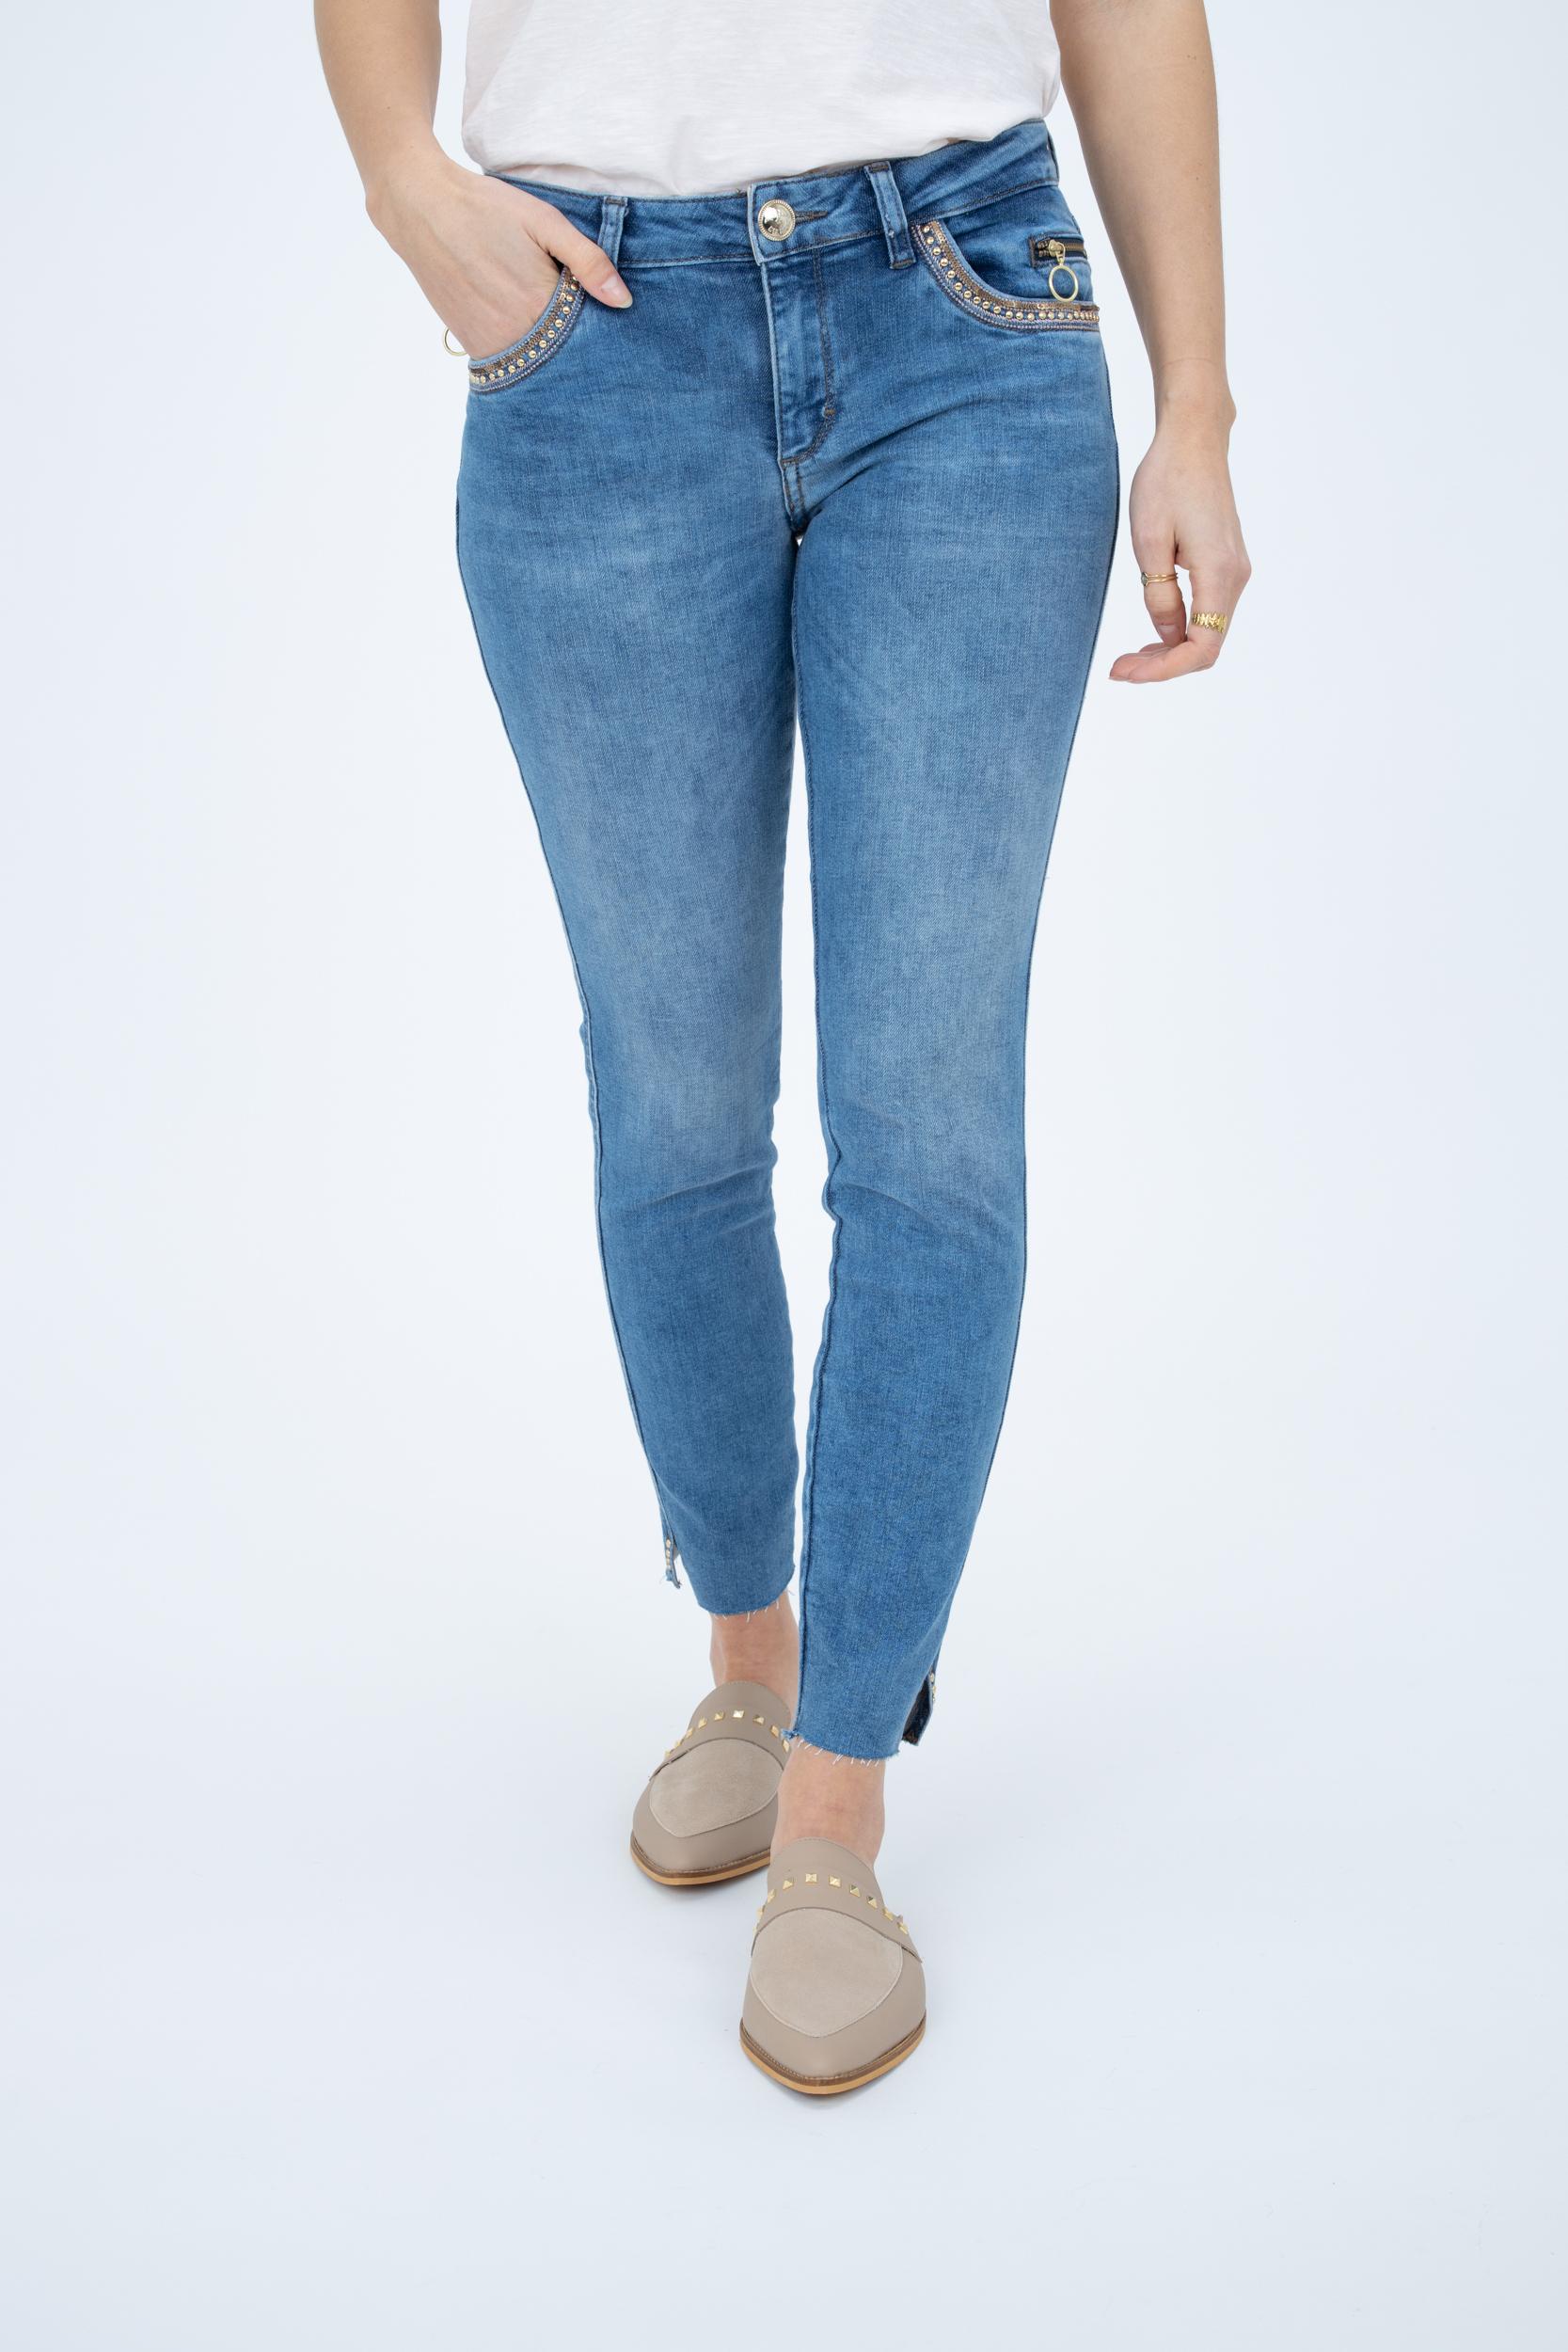 Jeans Summer Shine